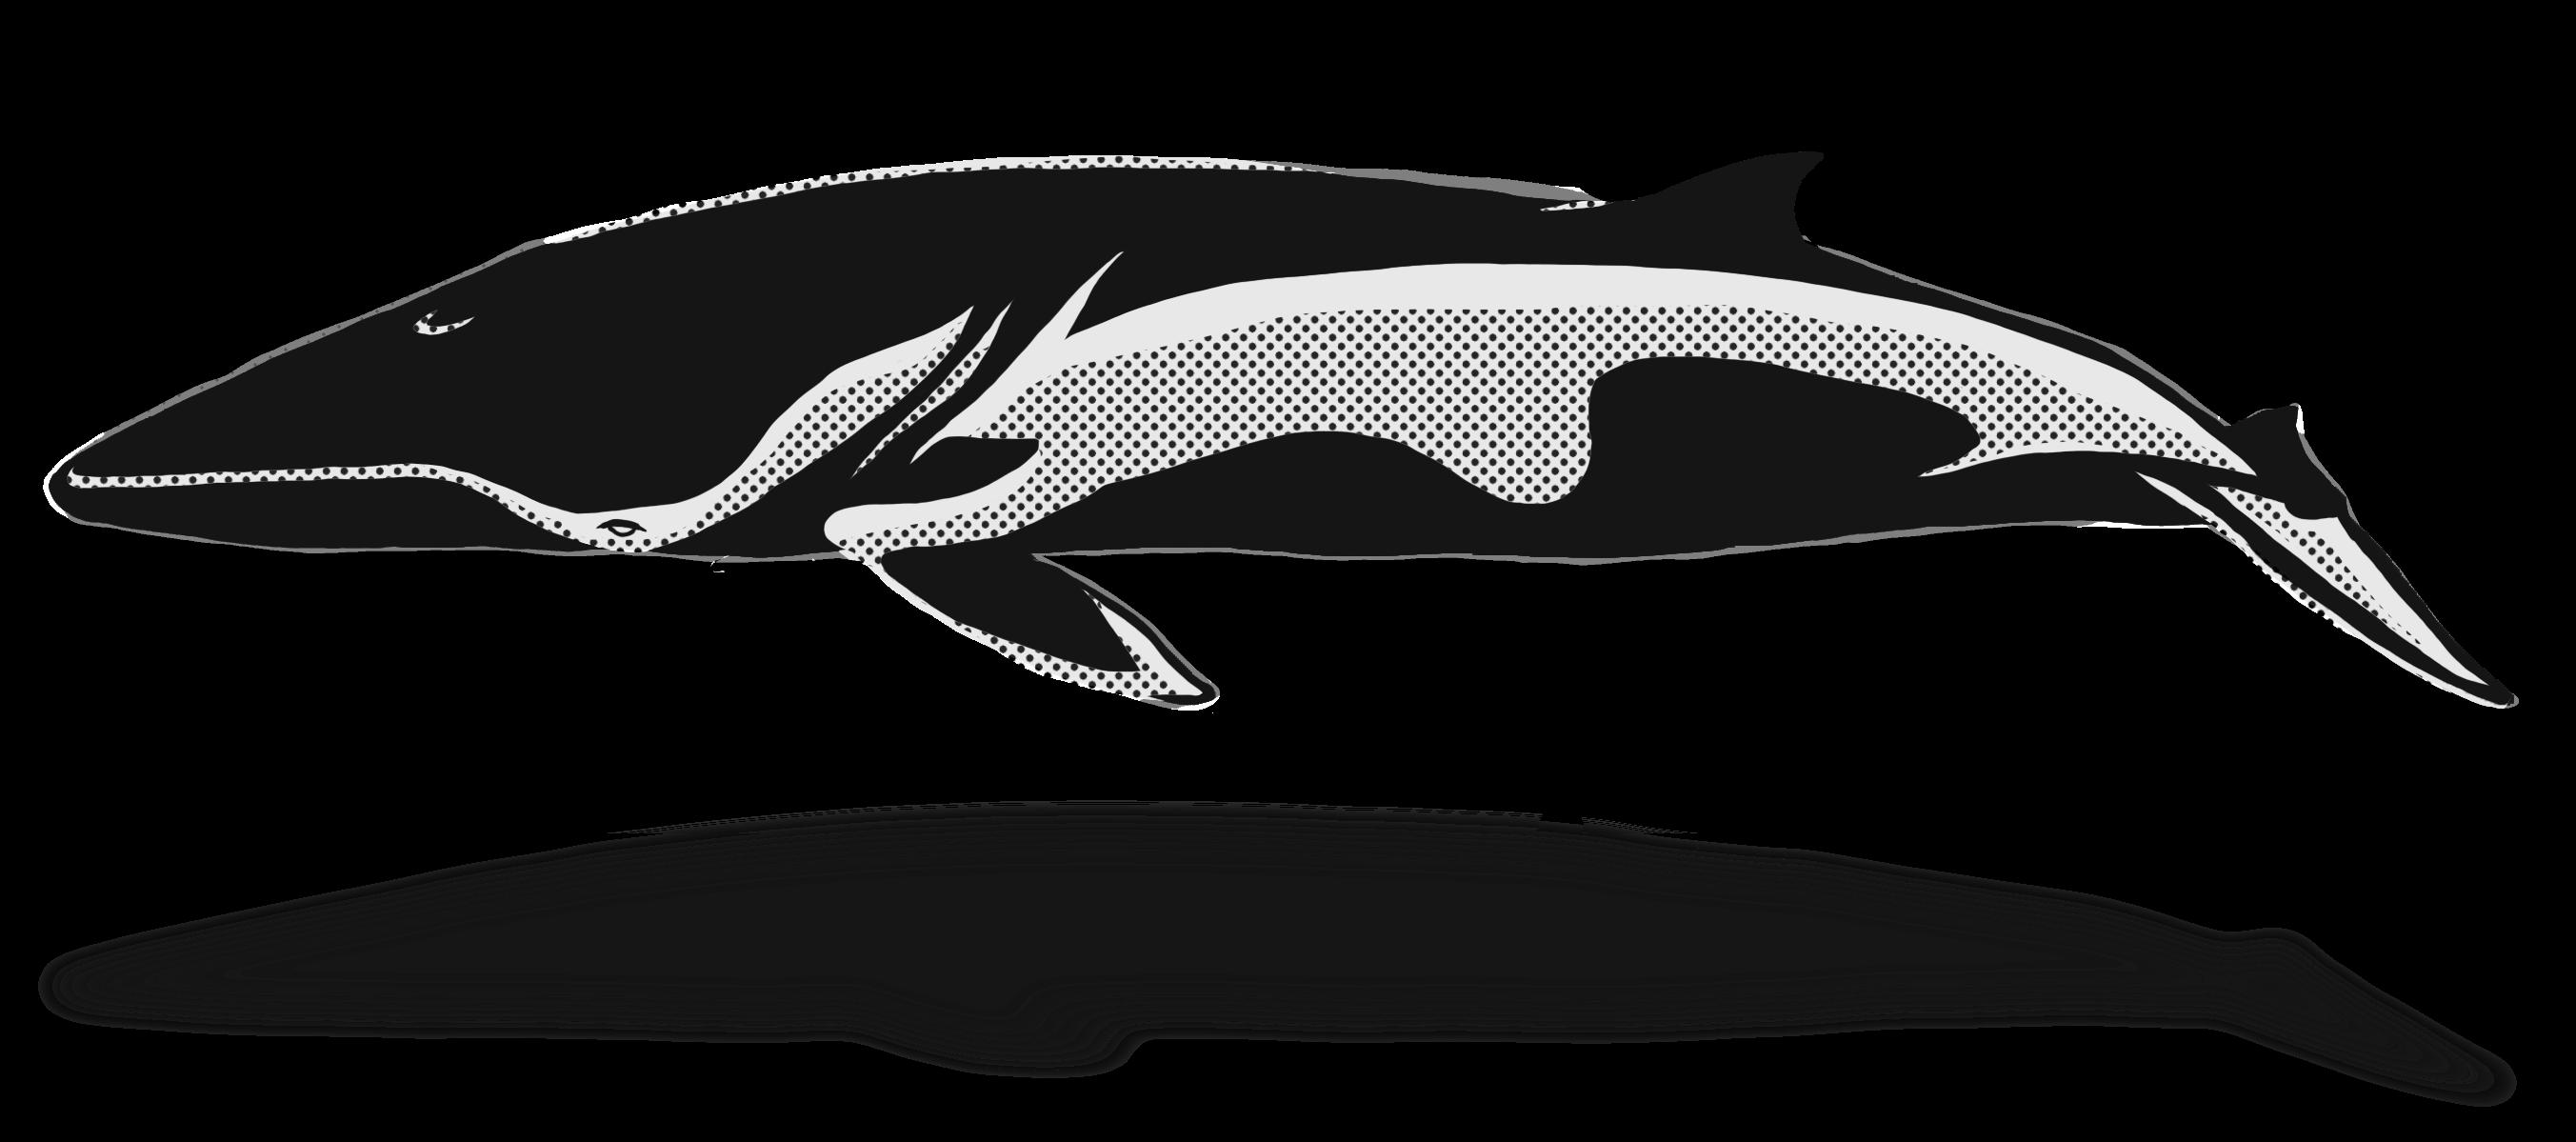 Clipart whale minke whale. Hd blue pacific sturgeon